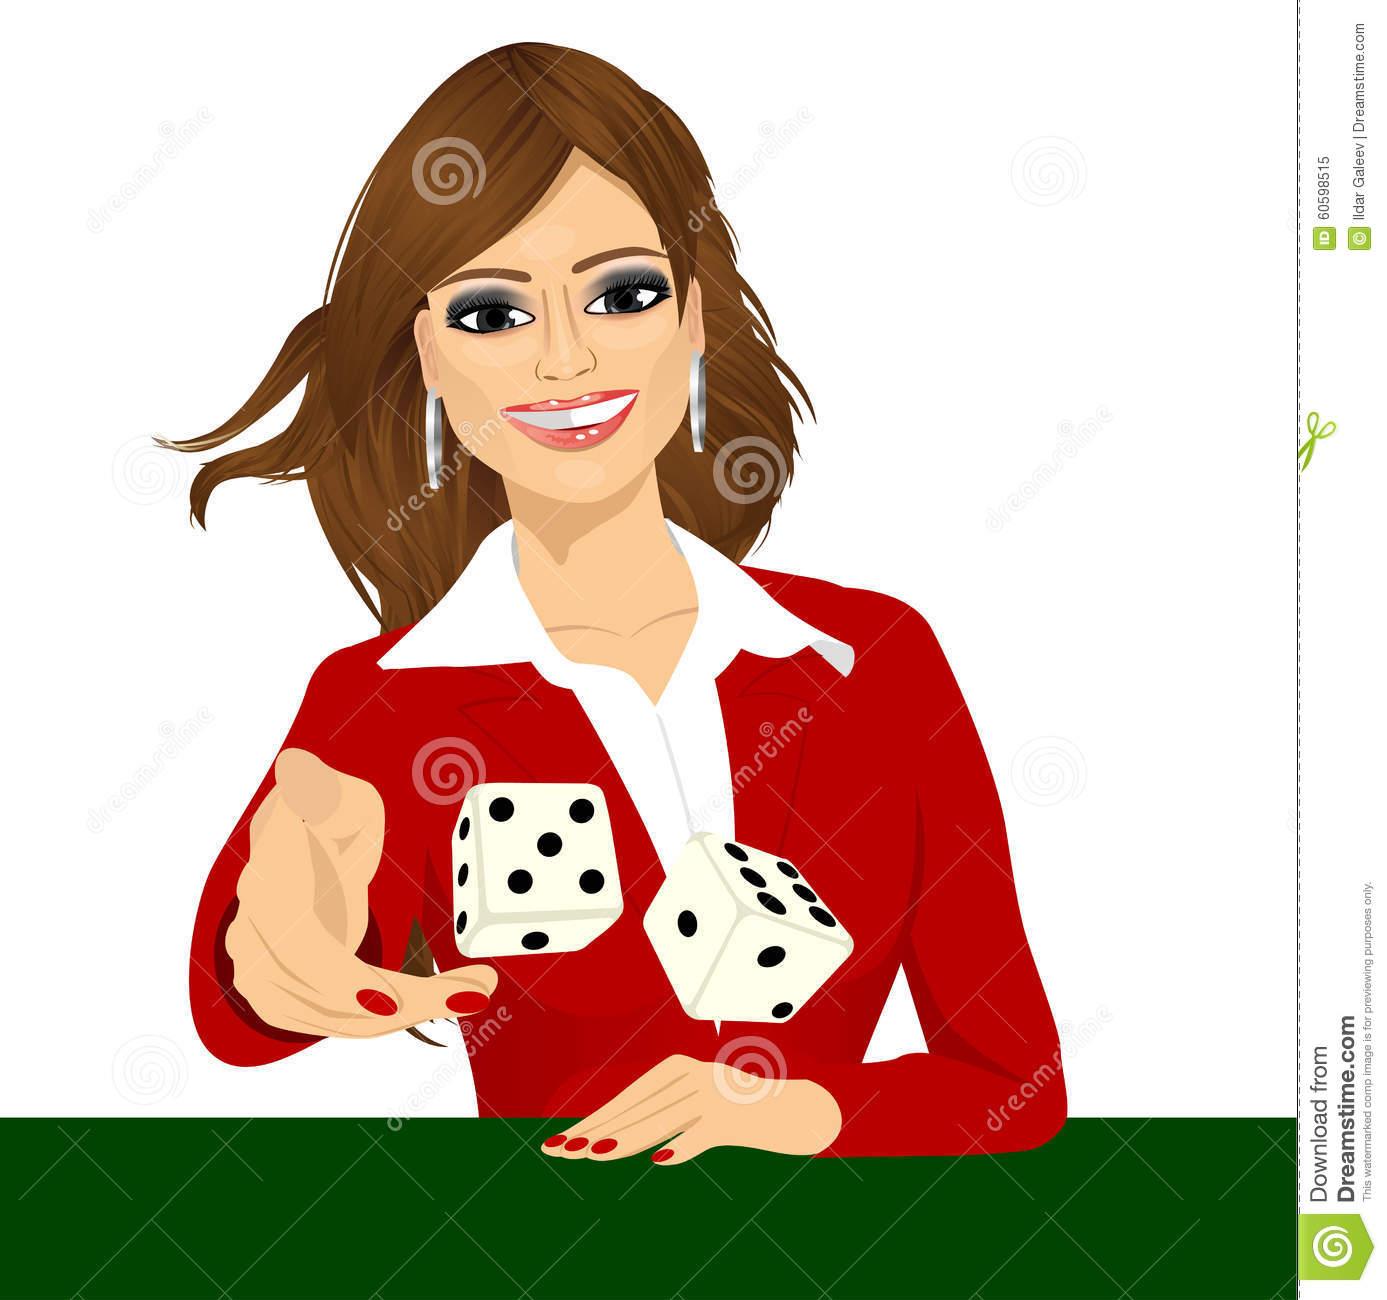 Woman Throwing The Dice Gambling Playing Craps Stock Vector.